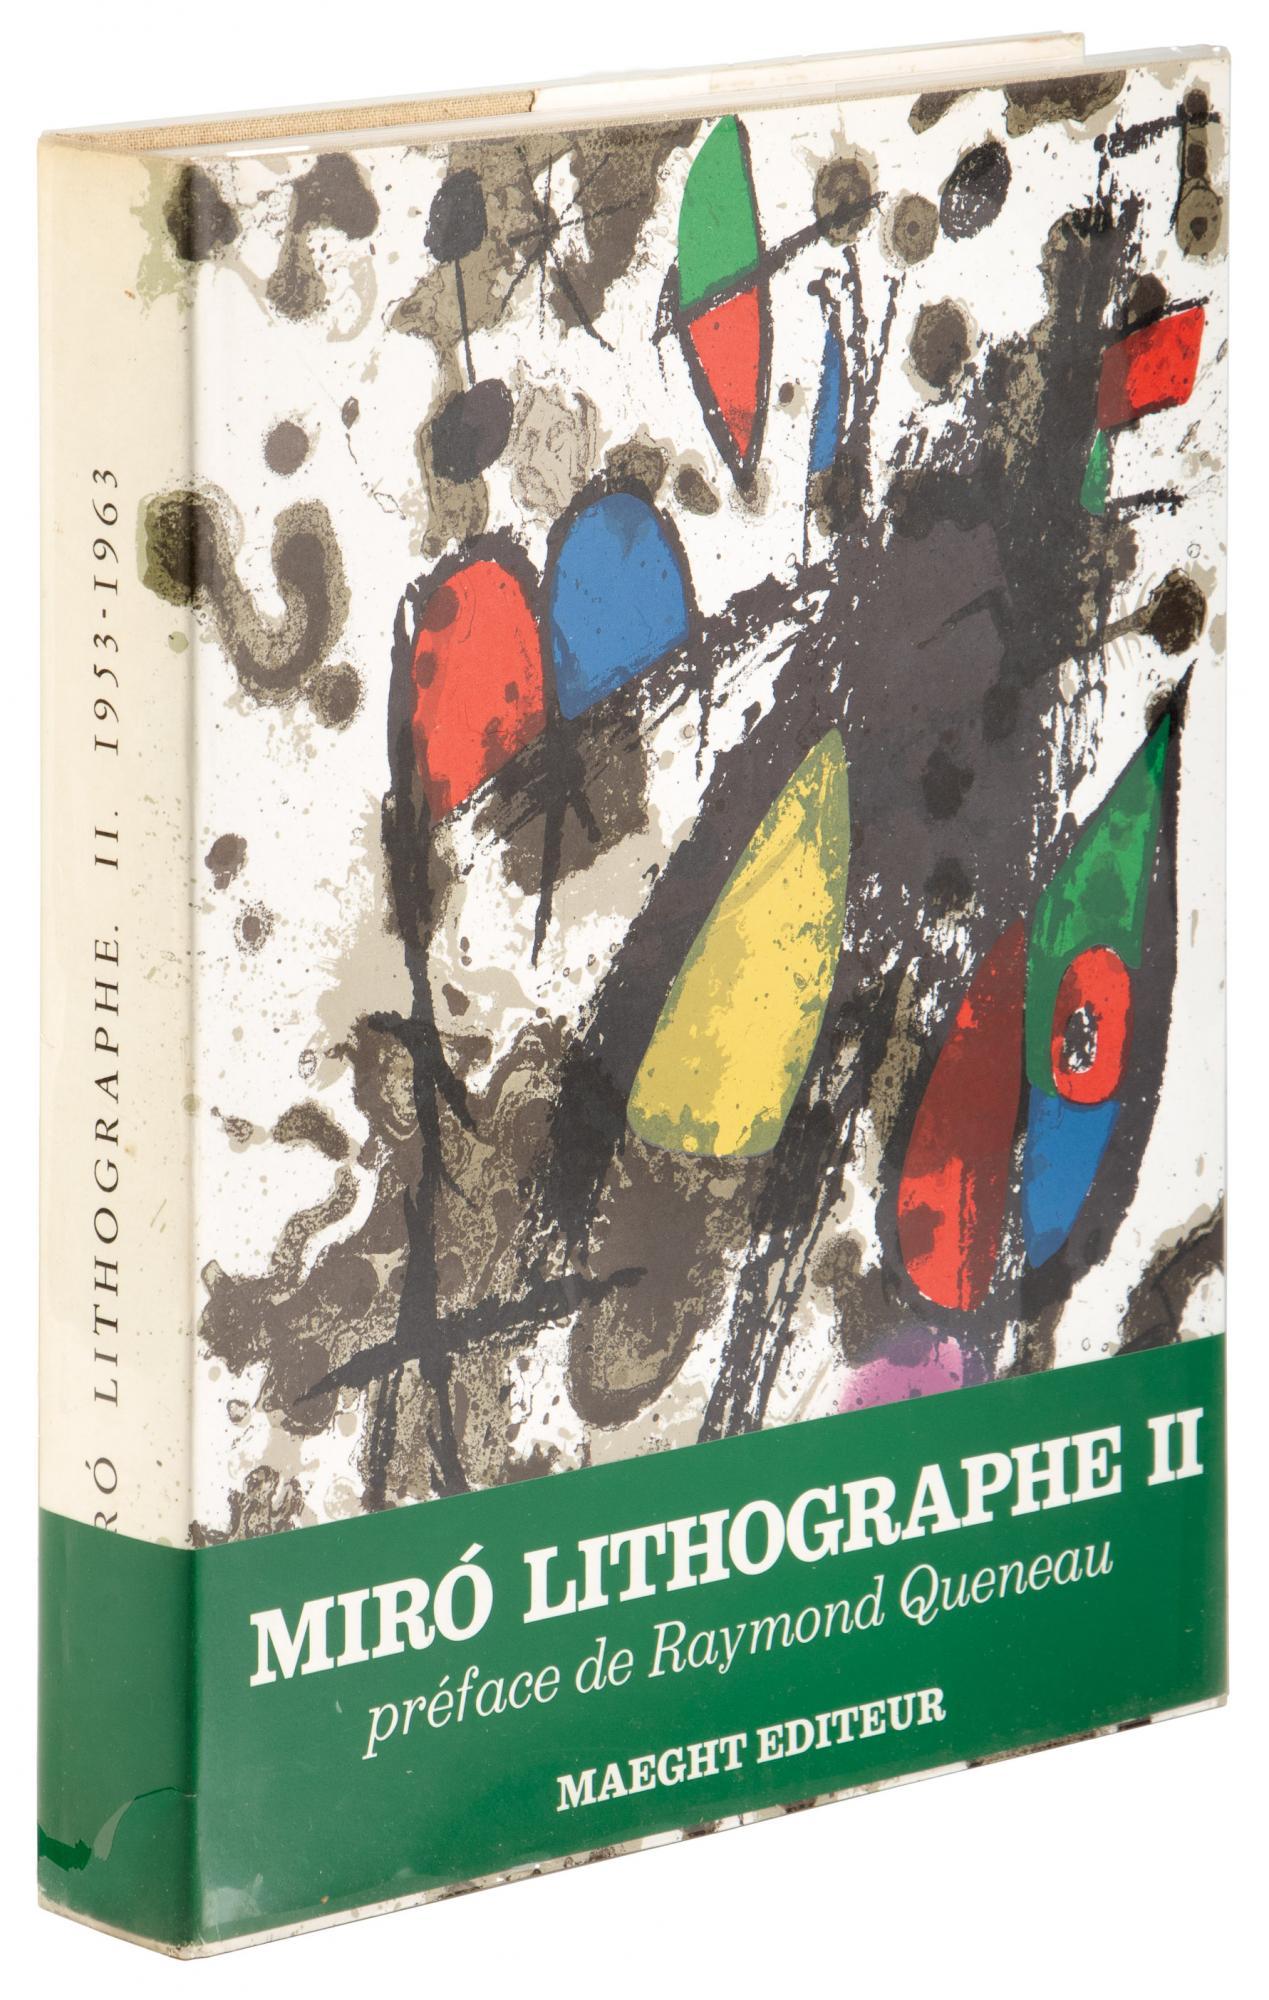 Joan Miro Lithographe II 1953-1963